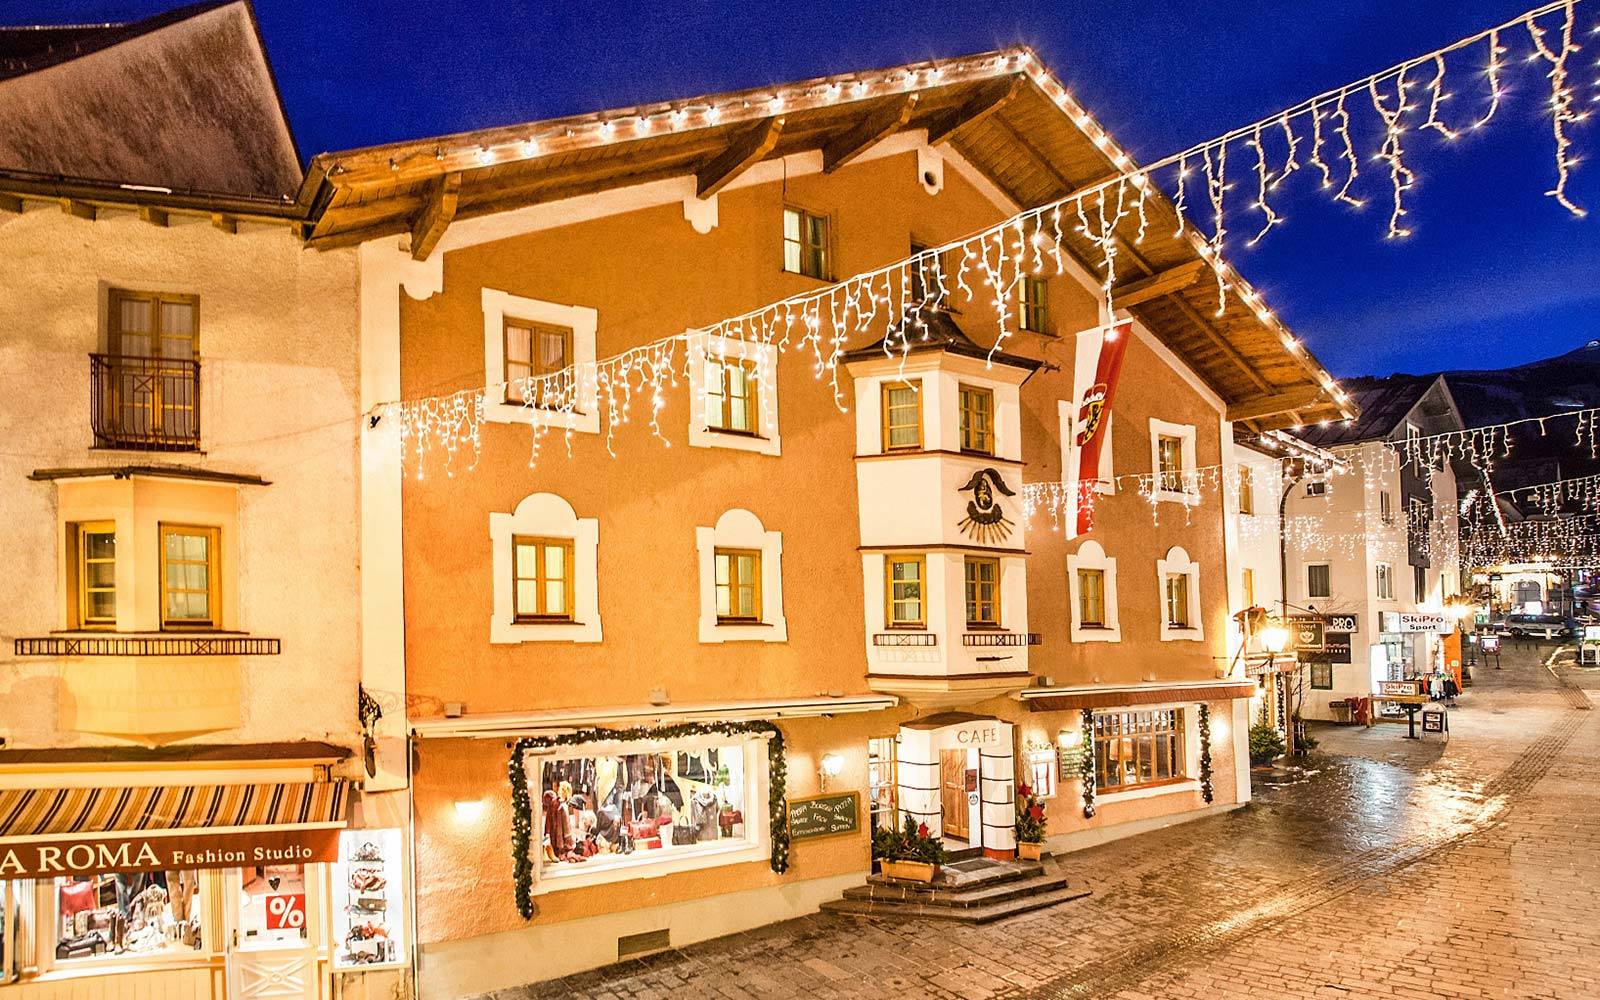 Cella Central Historic Boutique Hotel press information